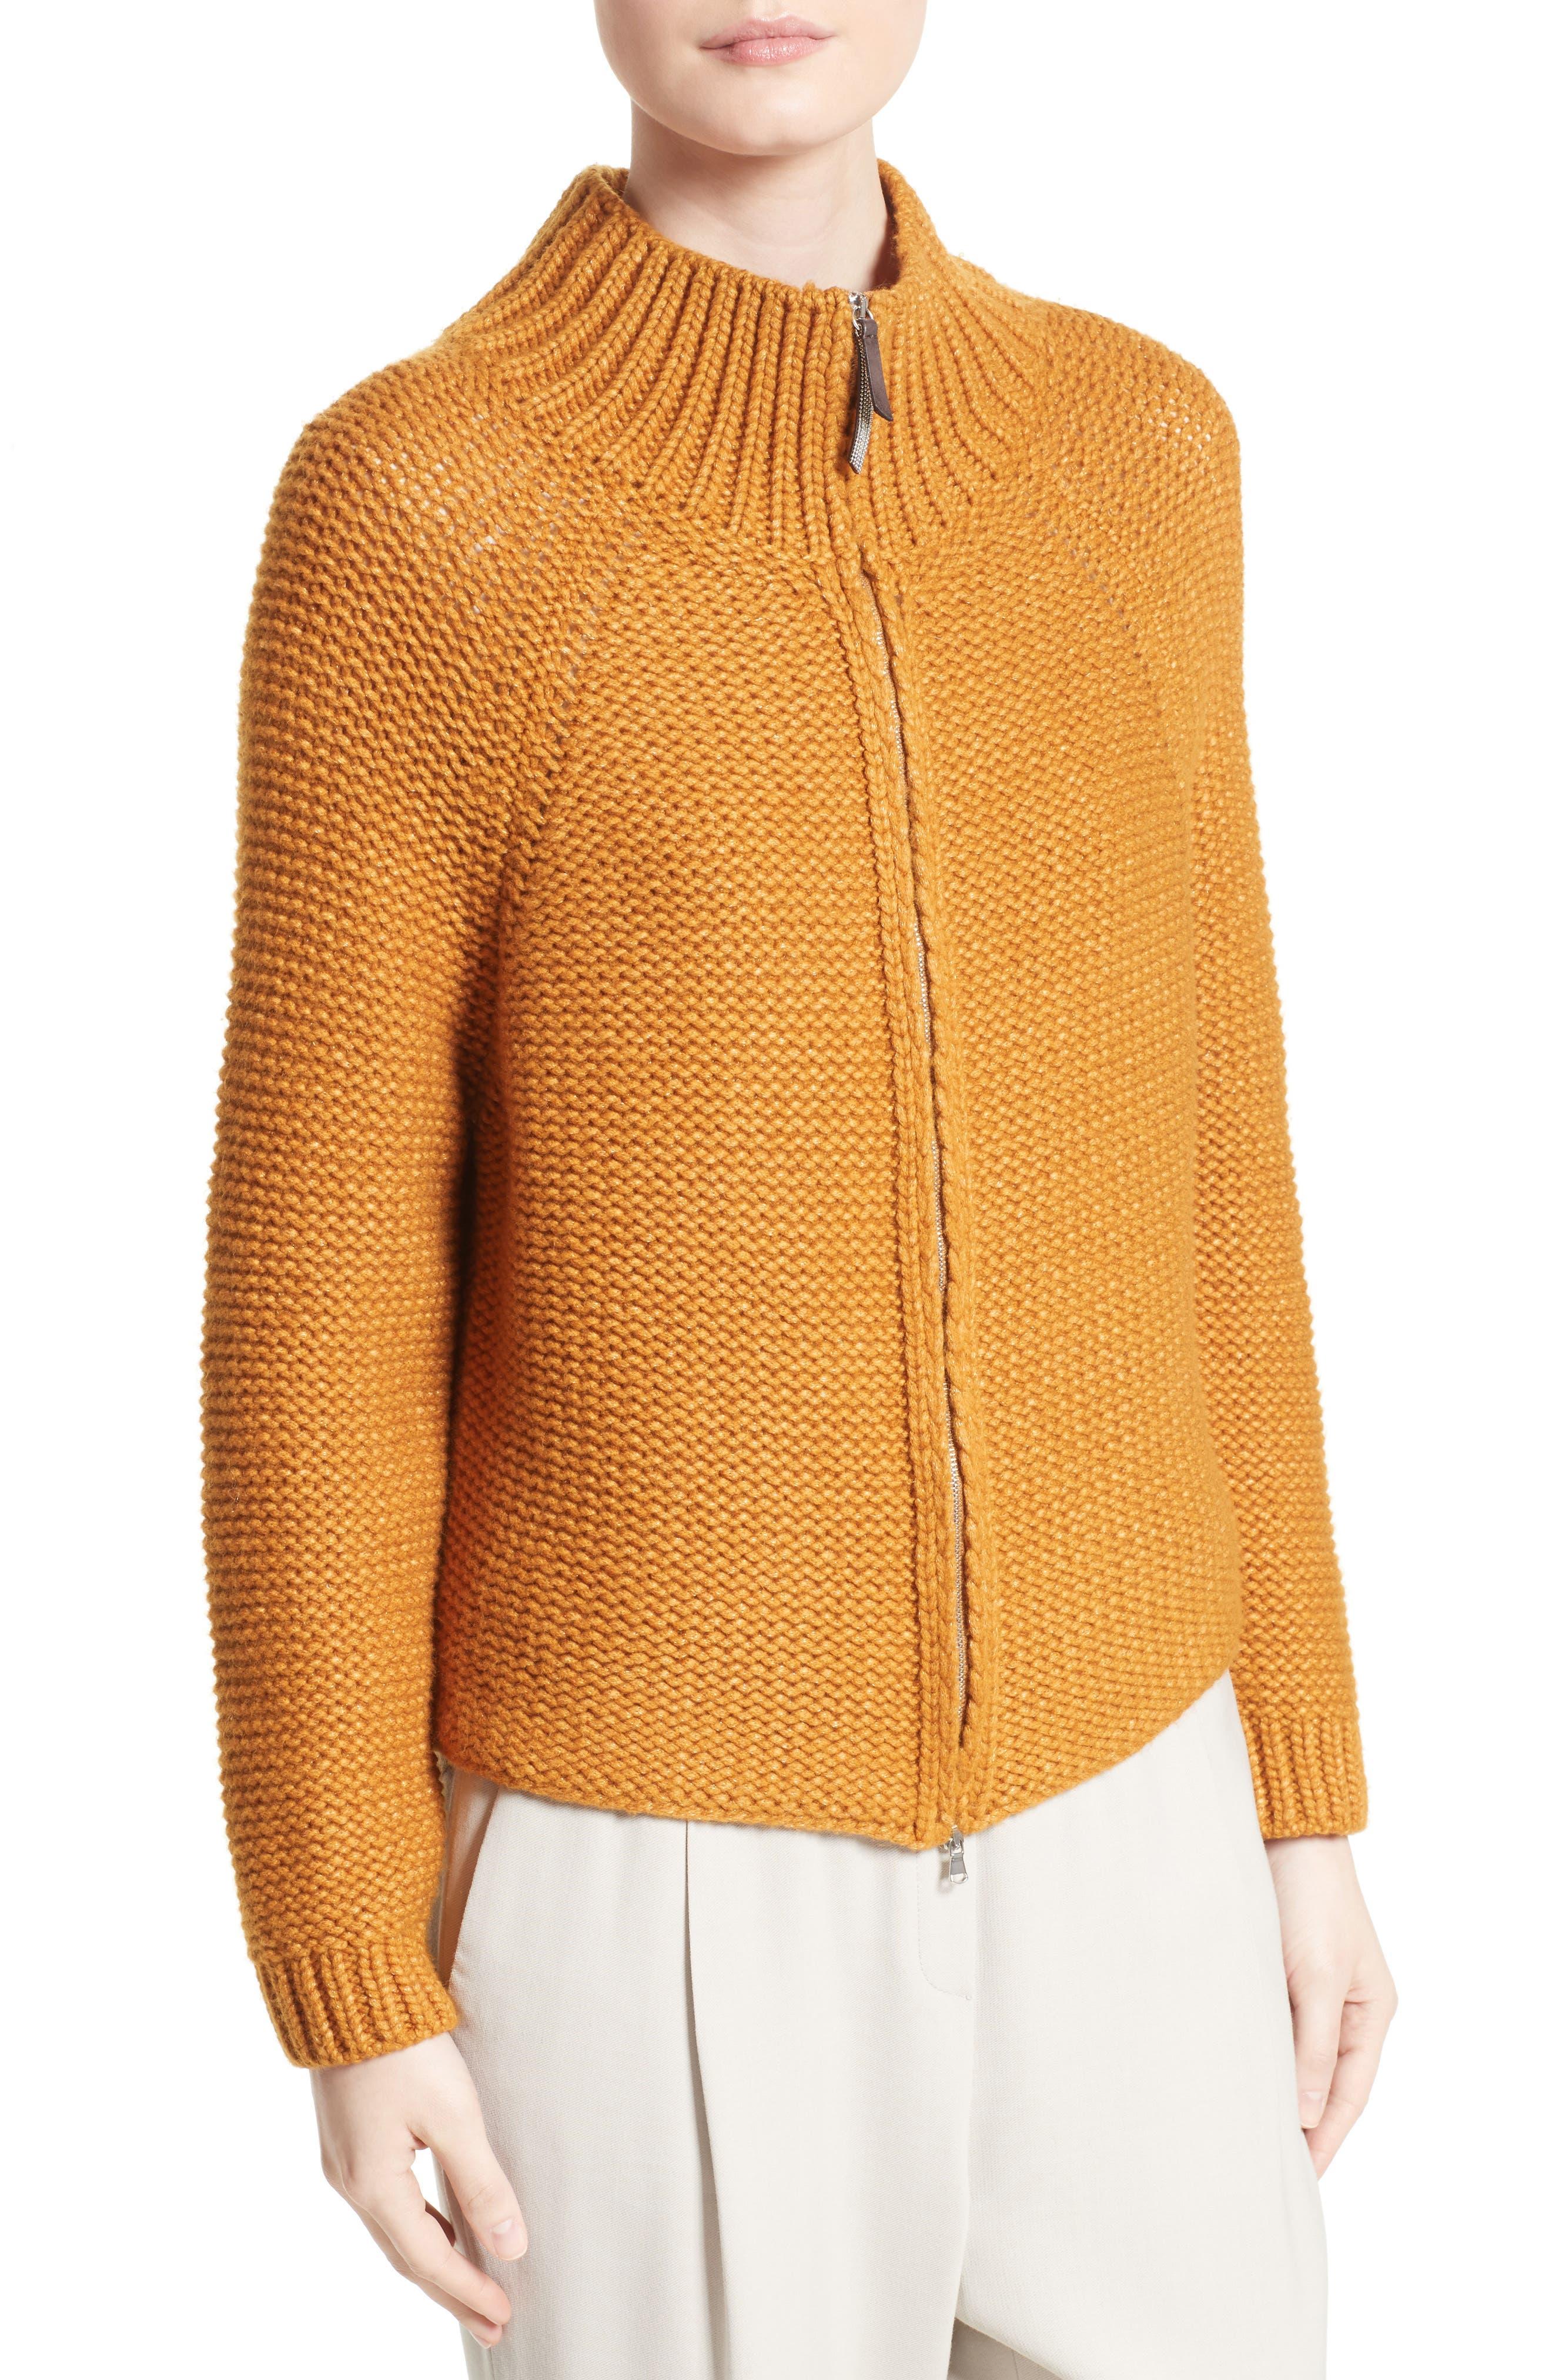 Knit Wool Blend Cardigan,                             Alternate thumbnail 6, color,                             Amber